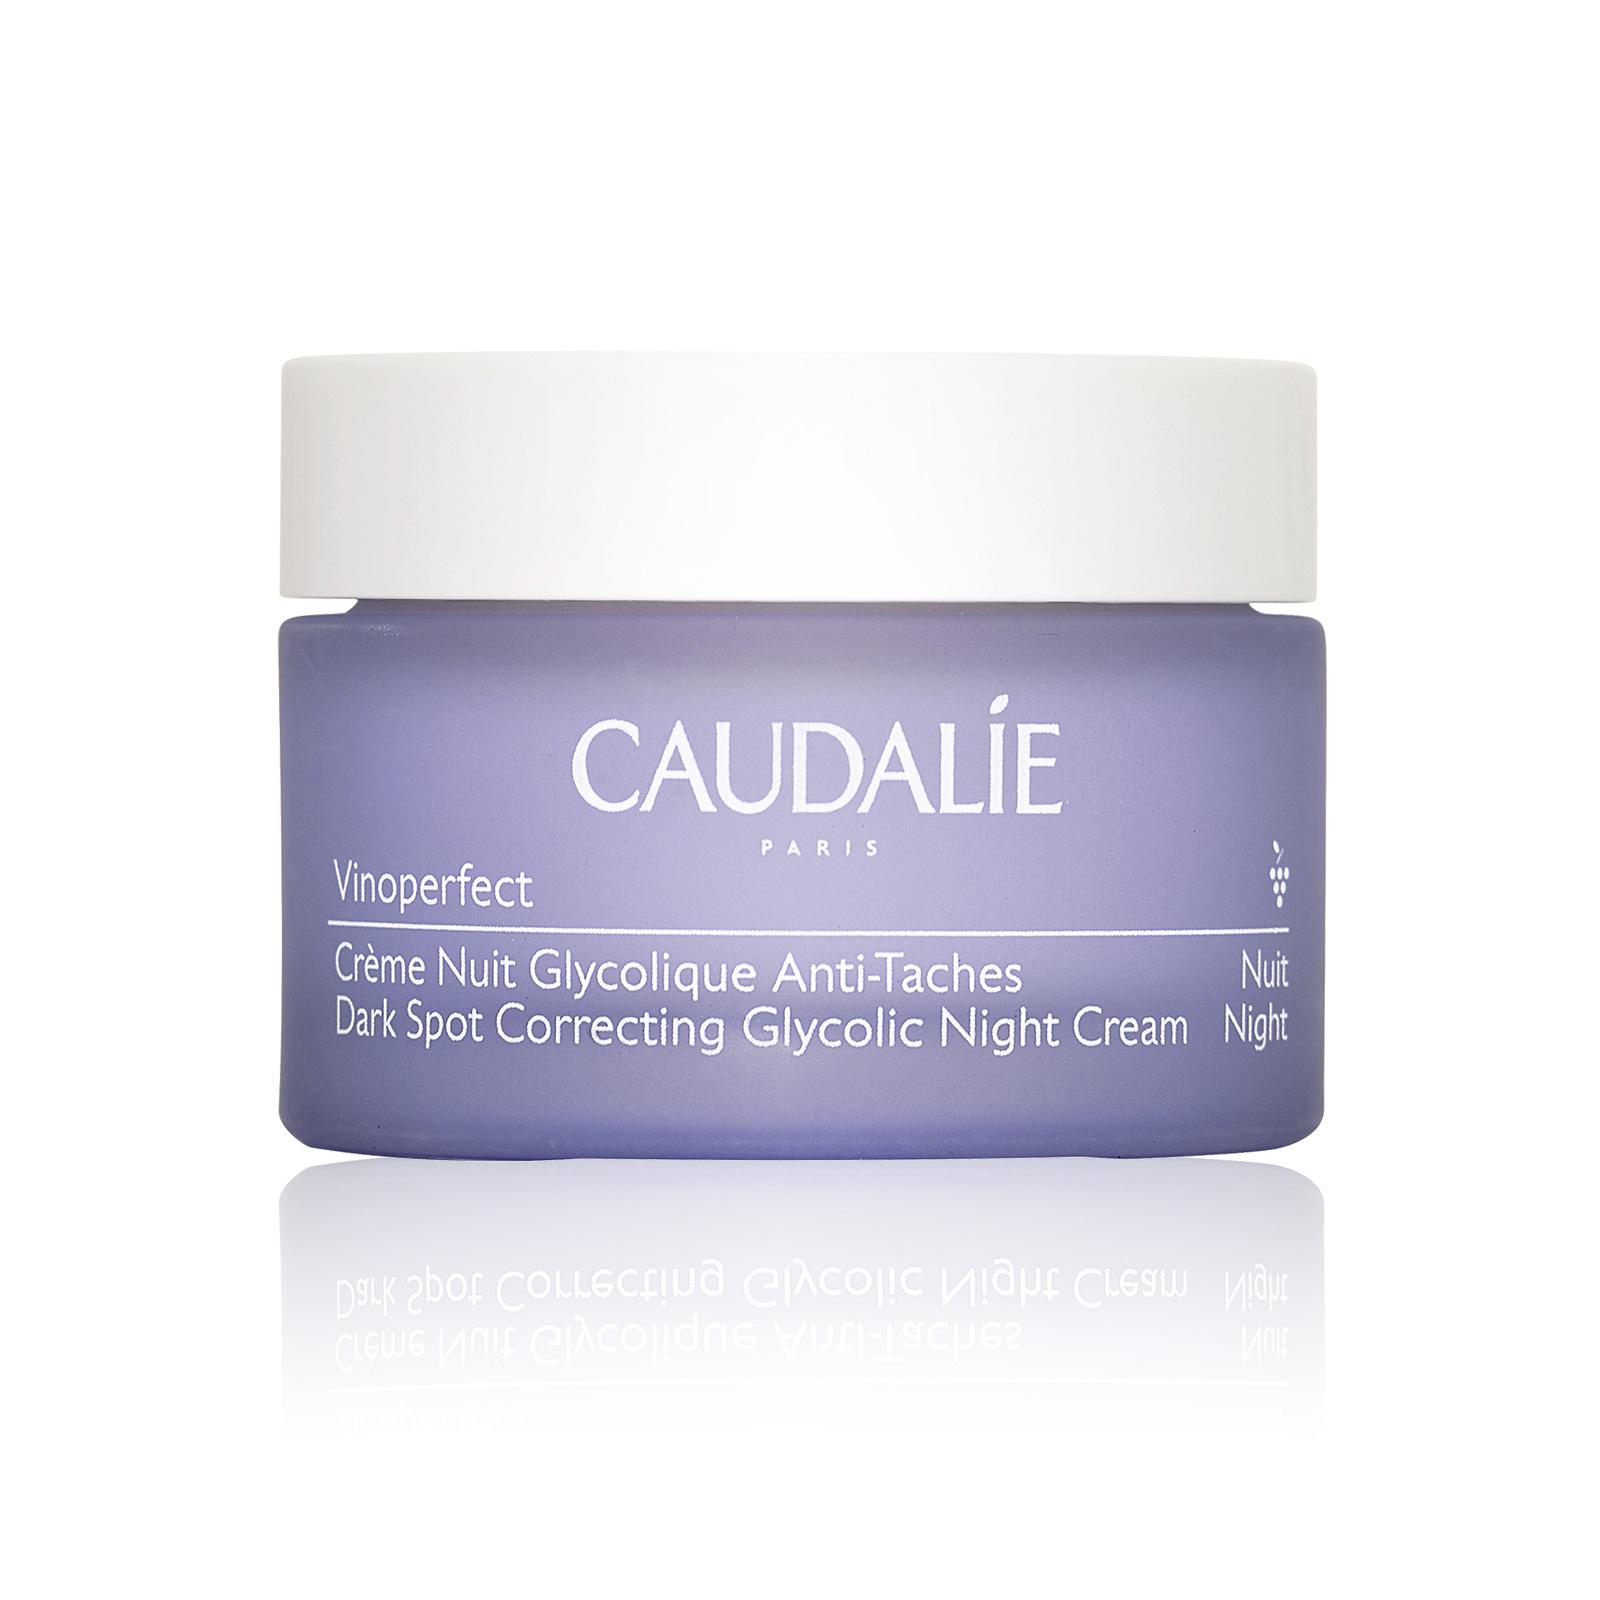 Vinoperfect Dark Spot Correcting Glycolic Night Cream